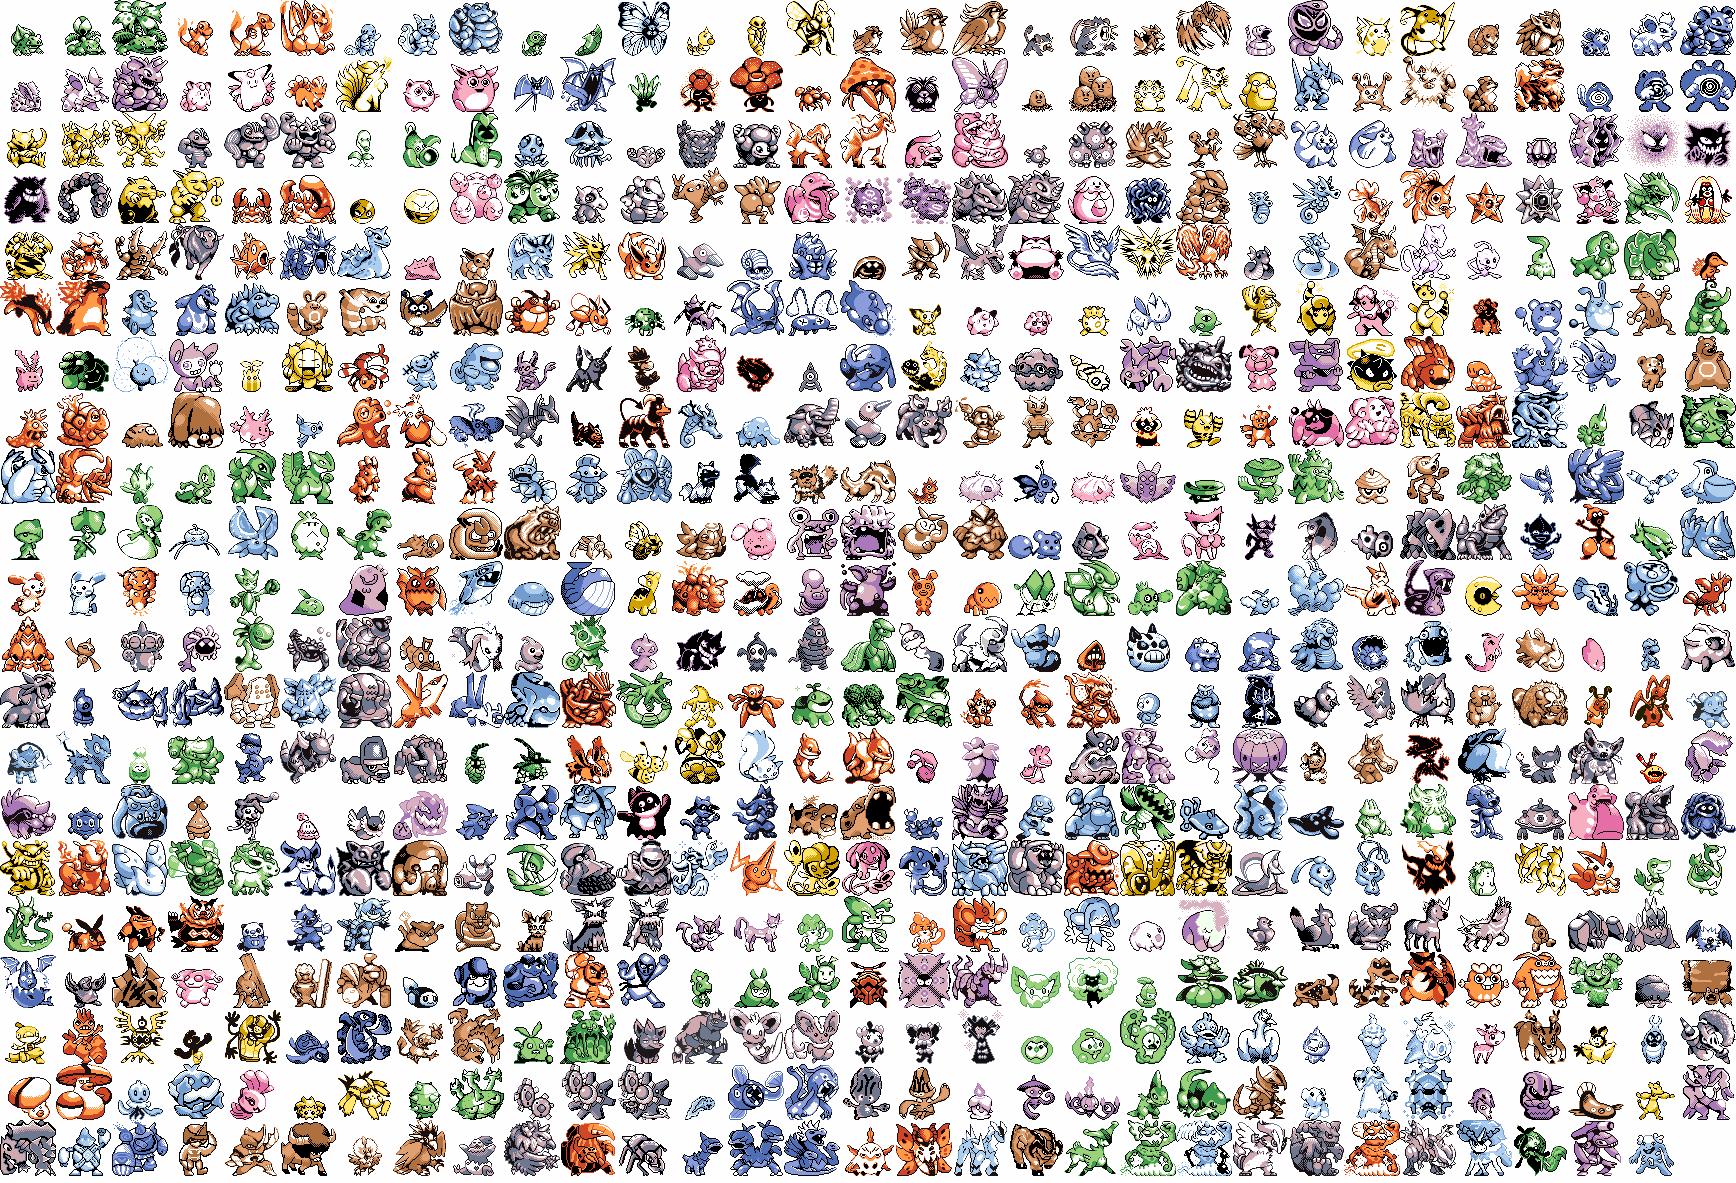 Pokemon from generation 2 5 drawn in gen 1 style pokmon know pokemon from generation 2 5 drawn in gen 1 style pokmon know your meme altavistaventures Choice Image